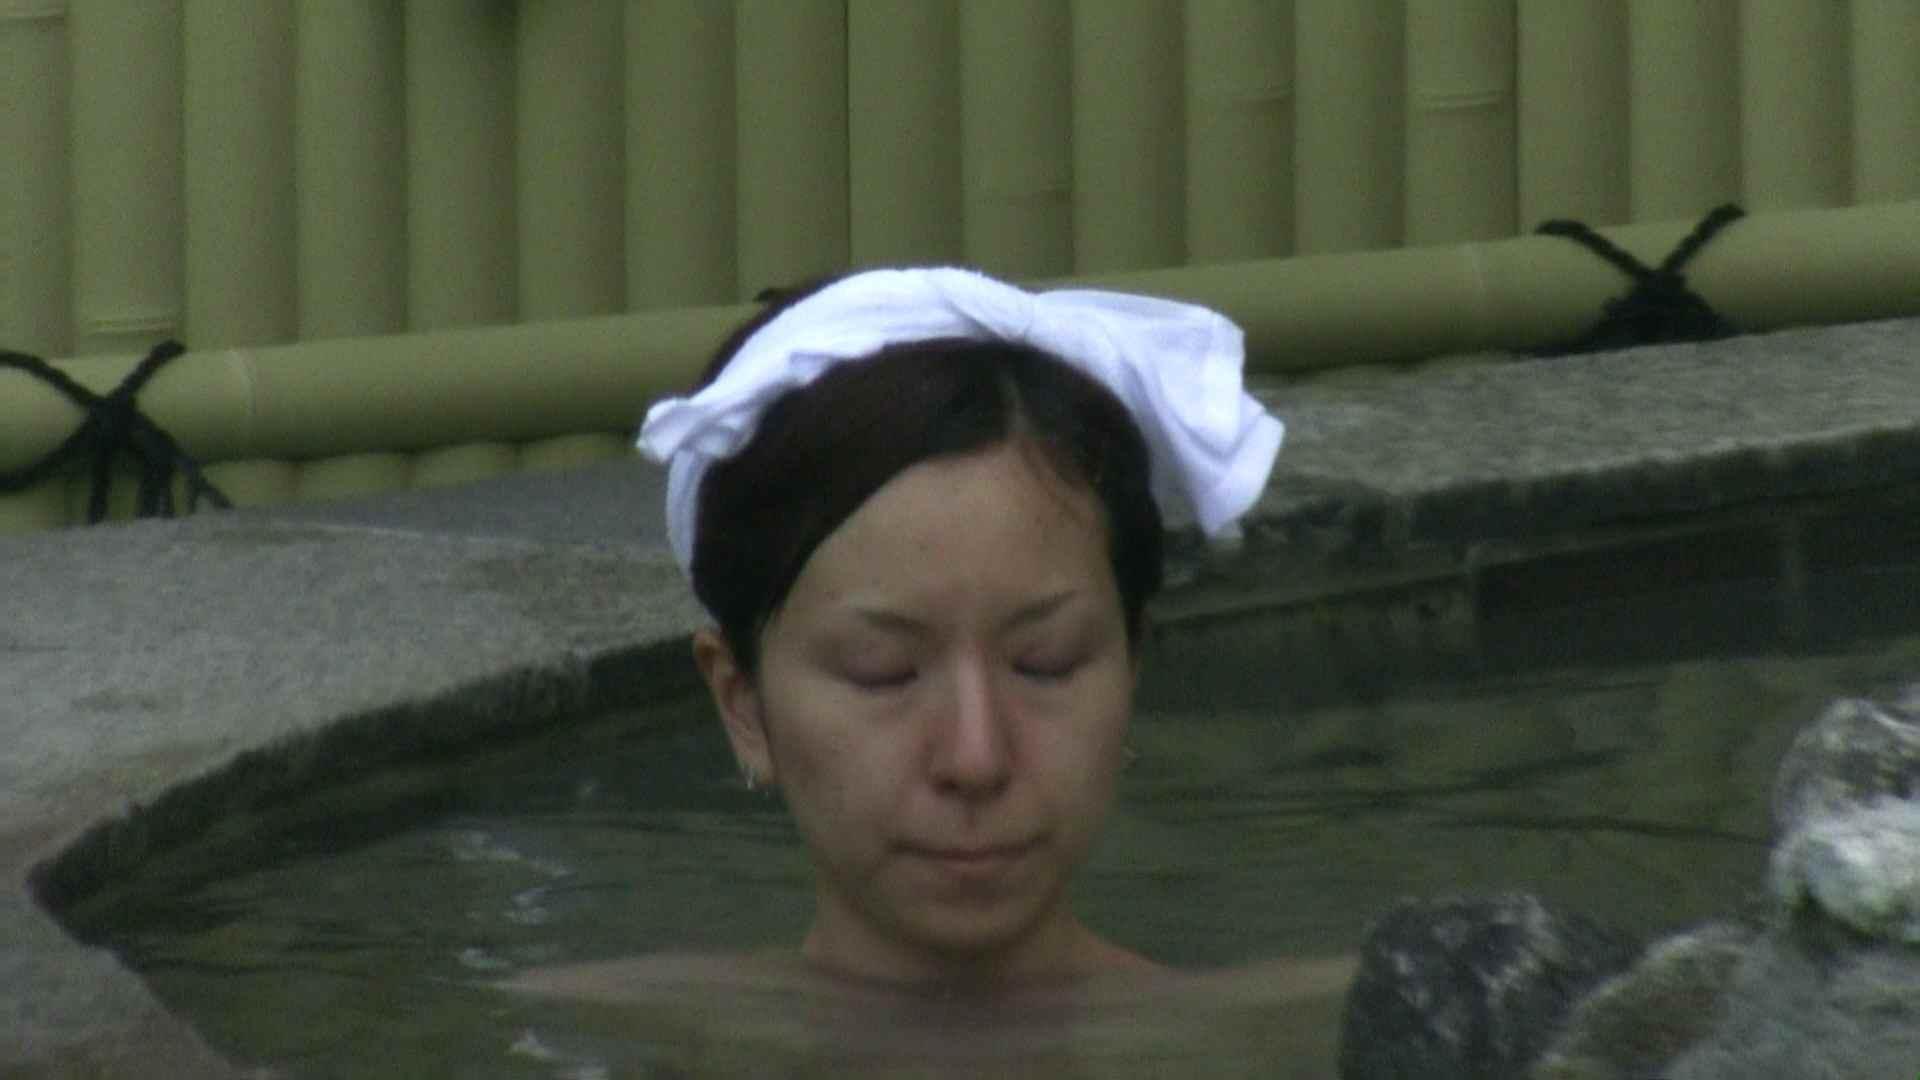 Aquaな露天風呂Vol.39【VIP】 綺麗なOLたち オマンコ動画キャプチャ 111枚 50